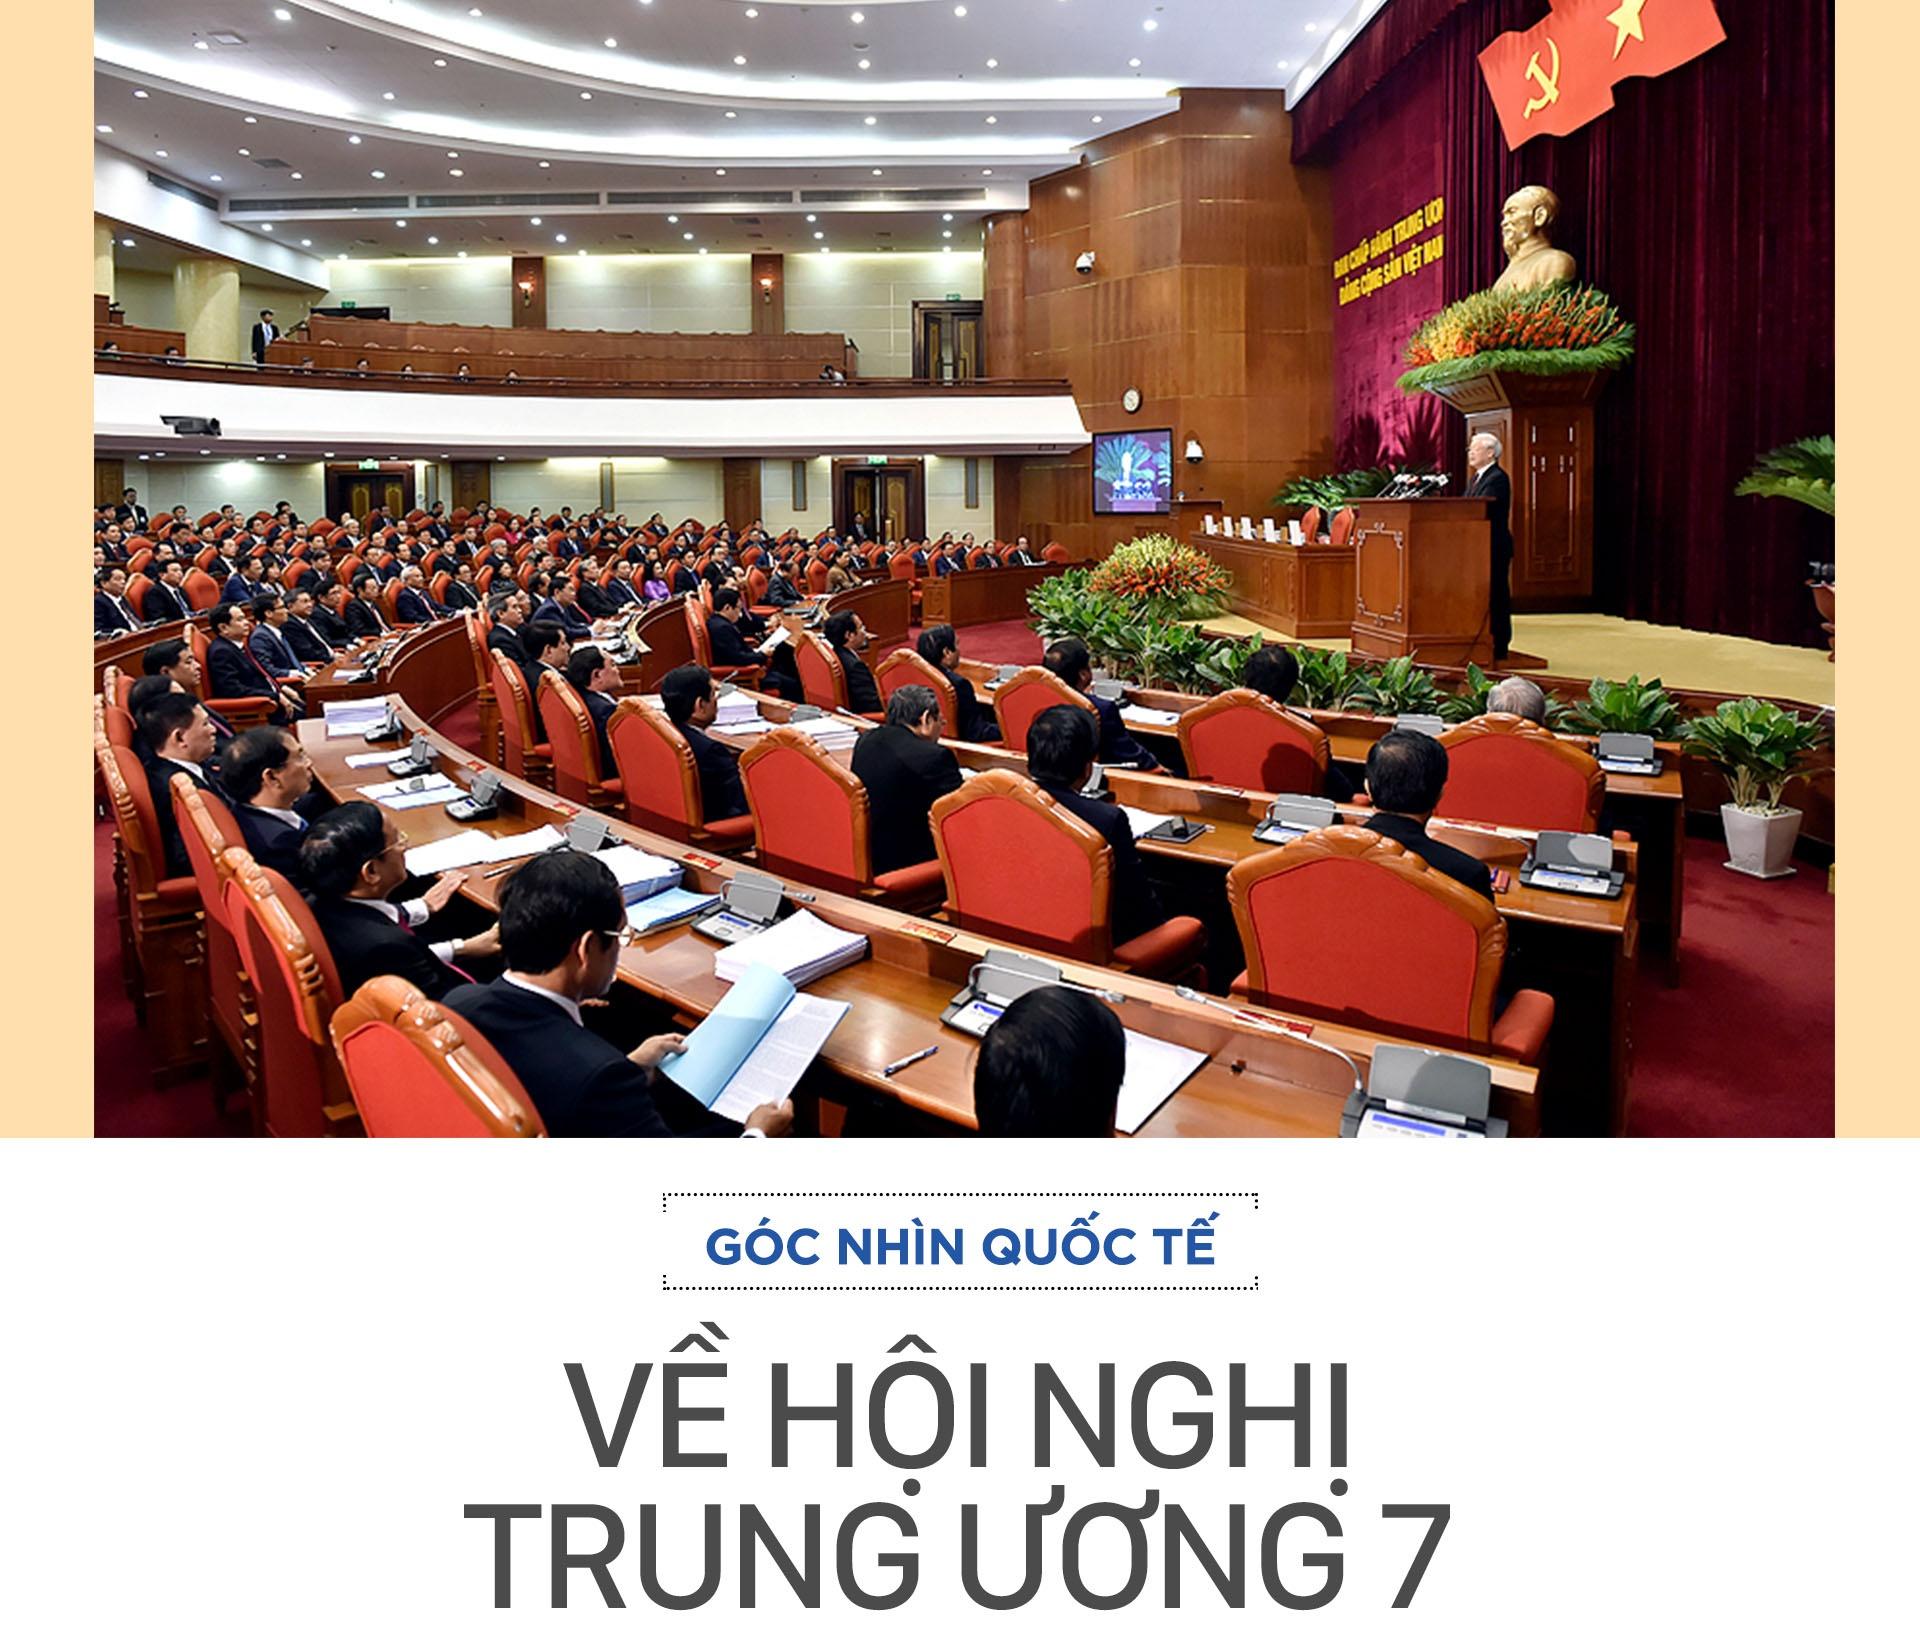 chong tham nhung hoi nghi TW7 anh 2